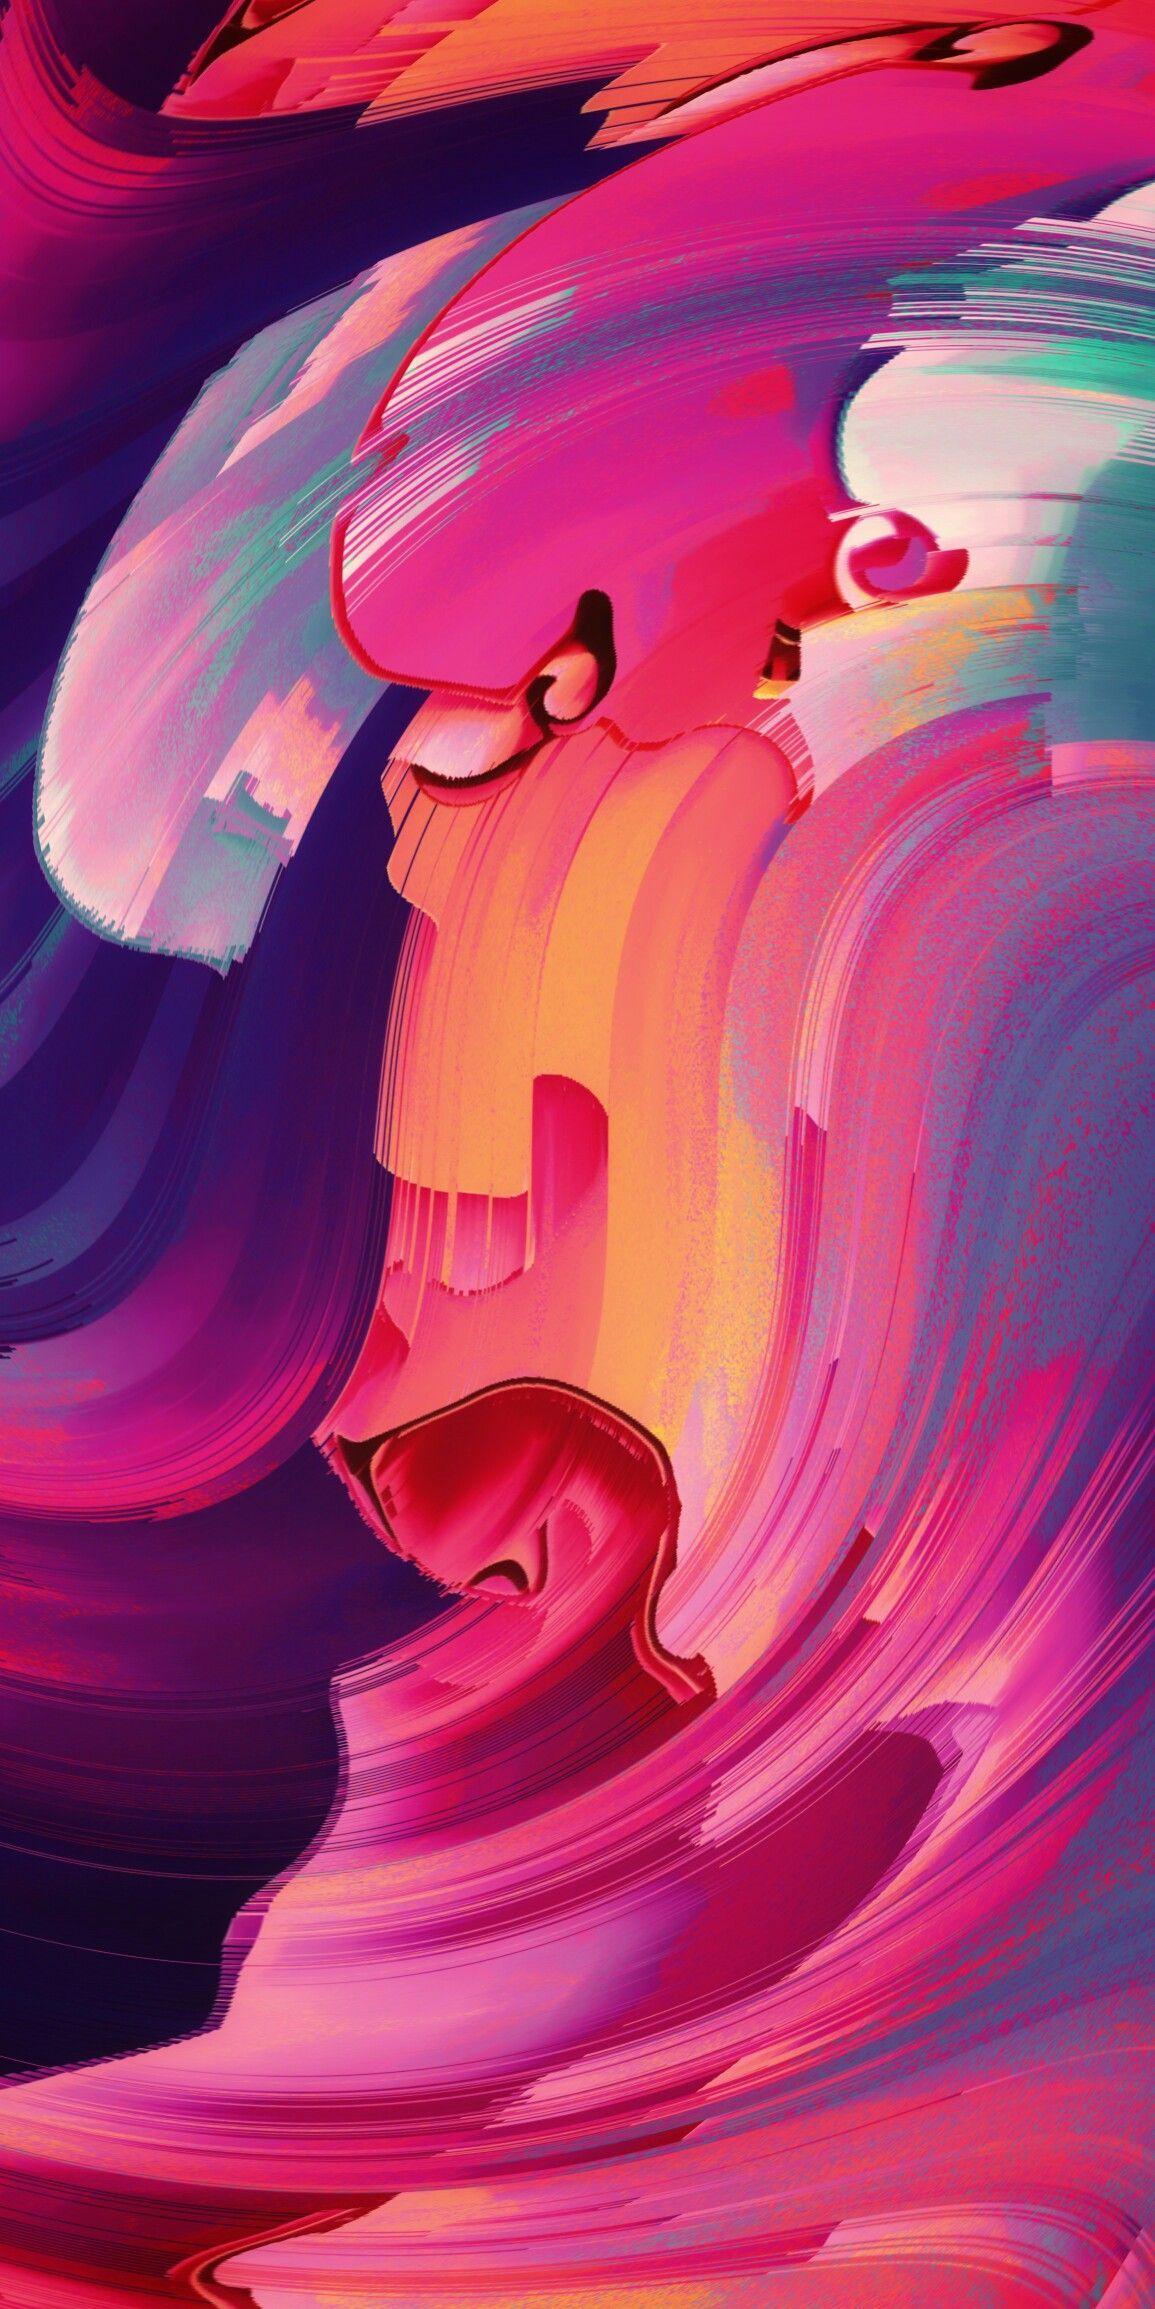 Artistic Expression 2020 Trend inspiration Ybklove YBlove 1155x2309